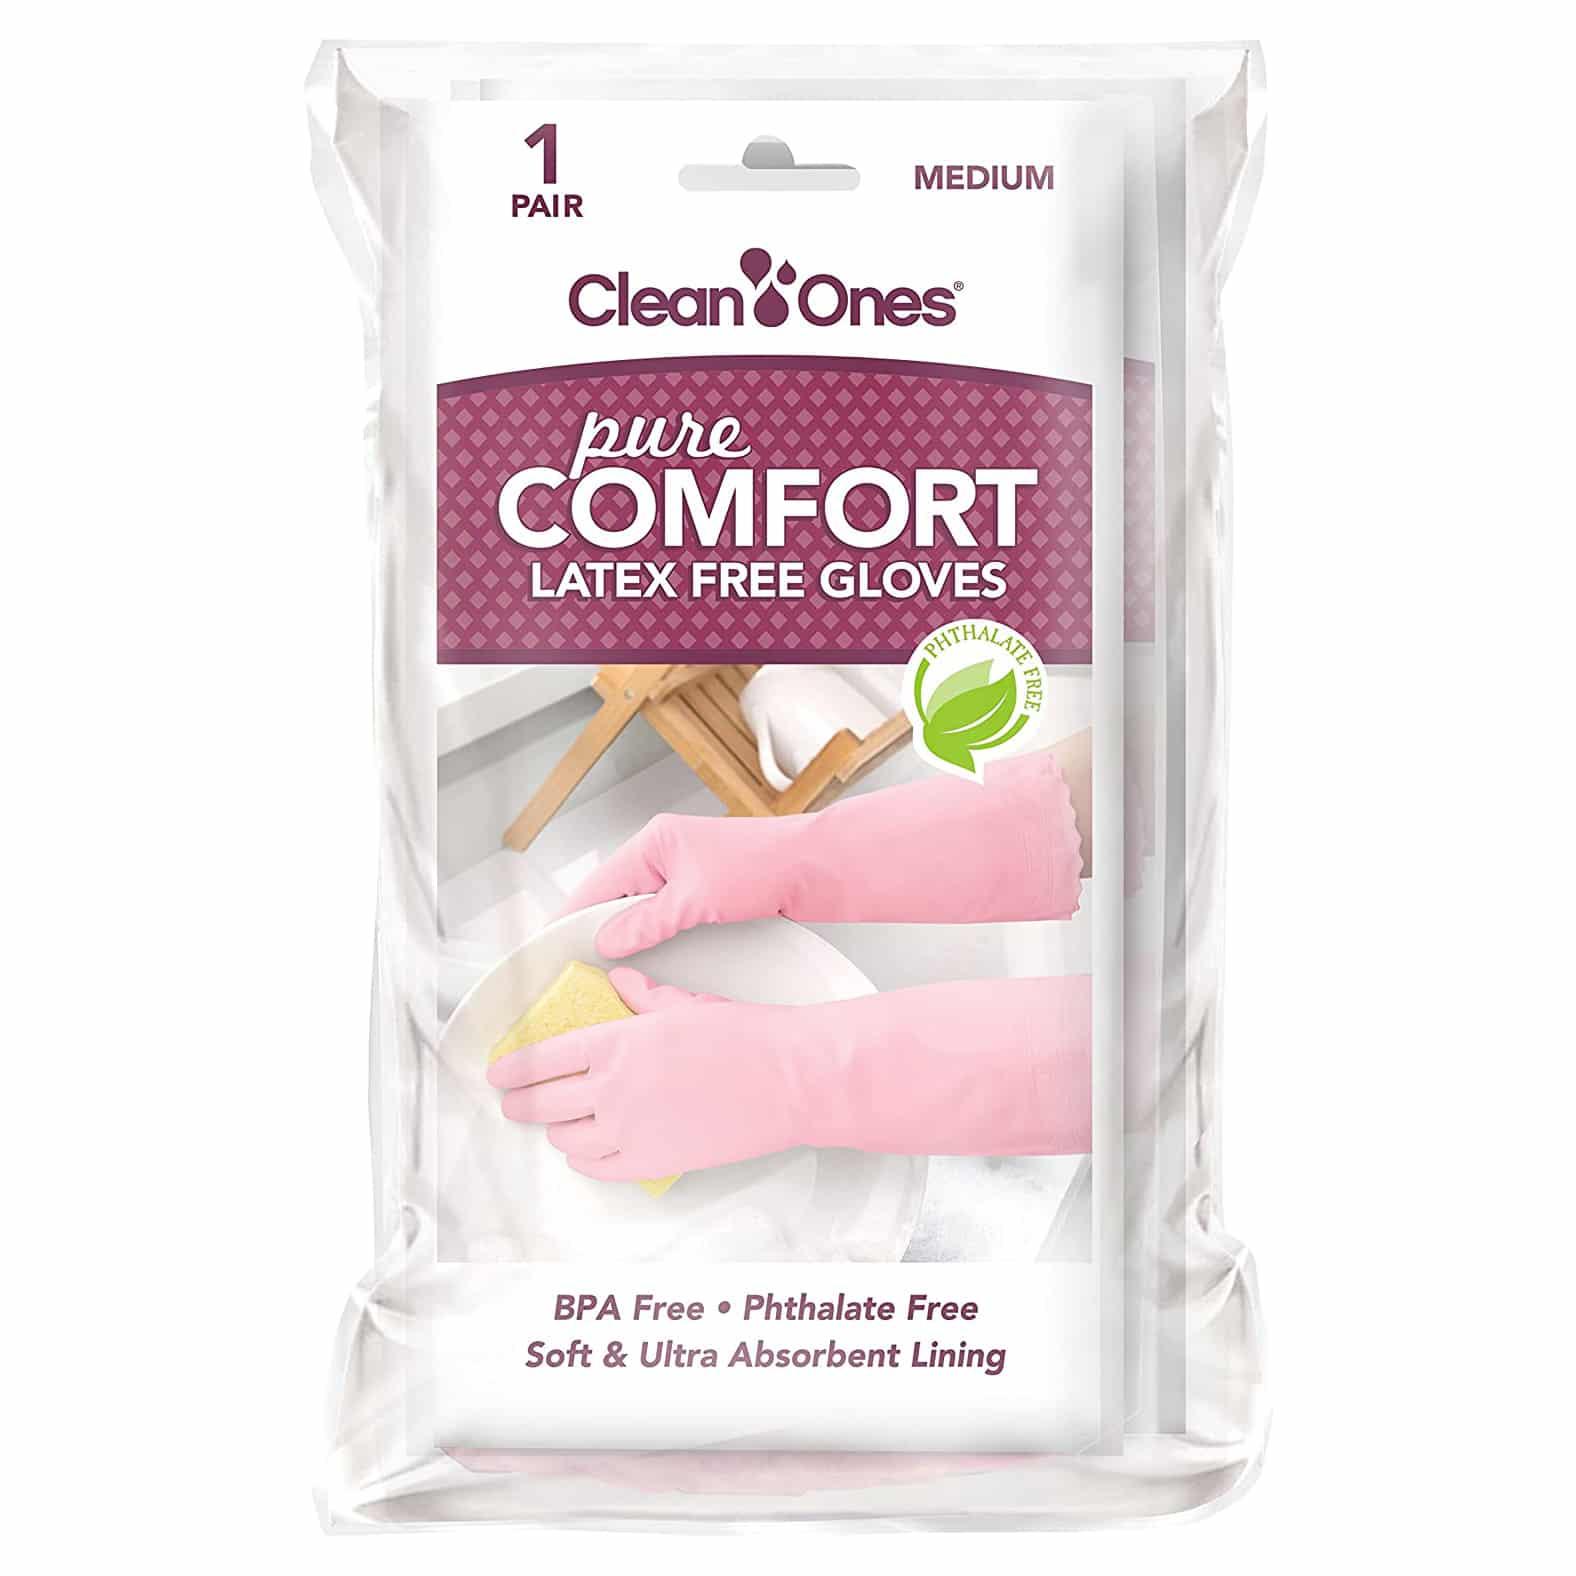 Clean Ones Pure Comfort Latex-Free Vinyl Gloves